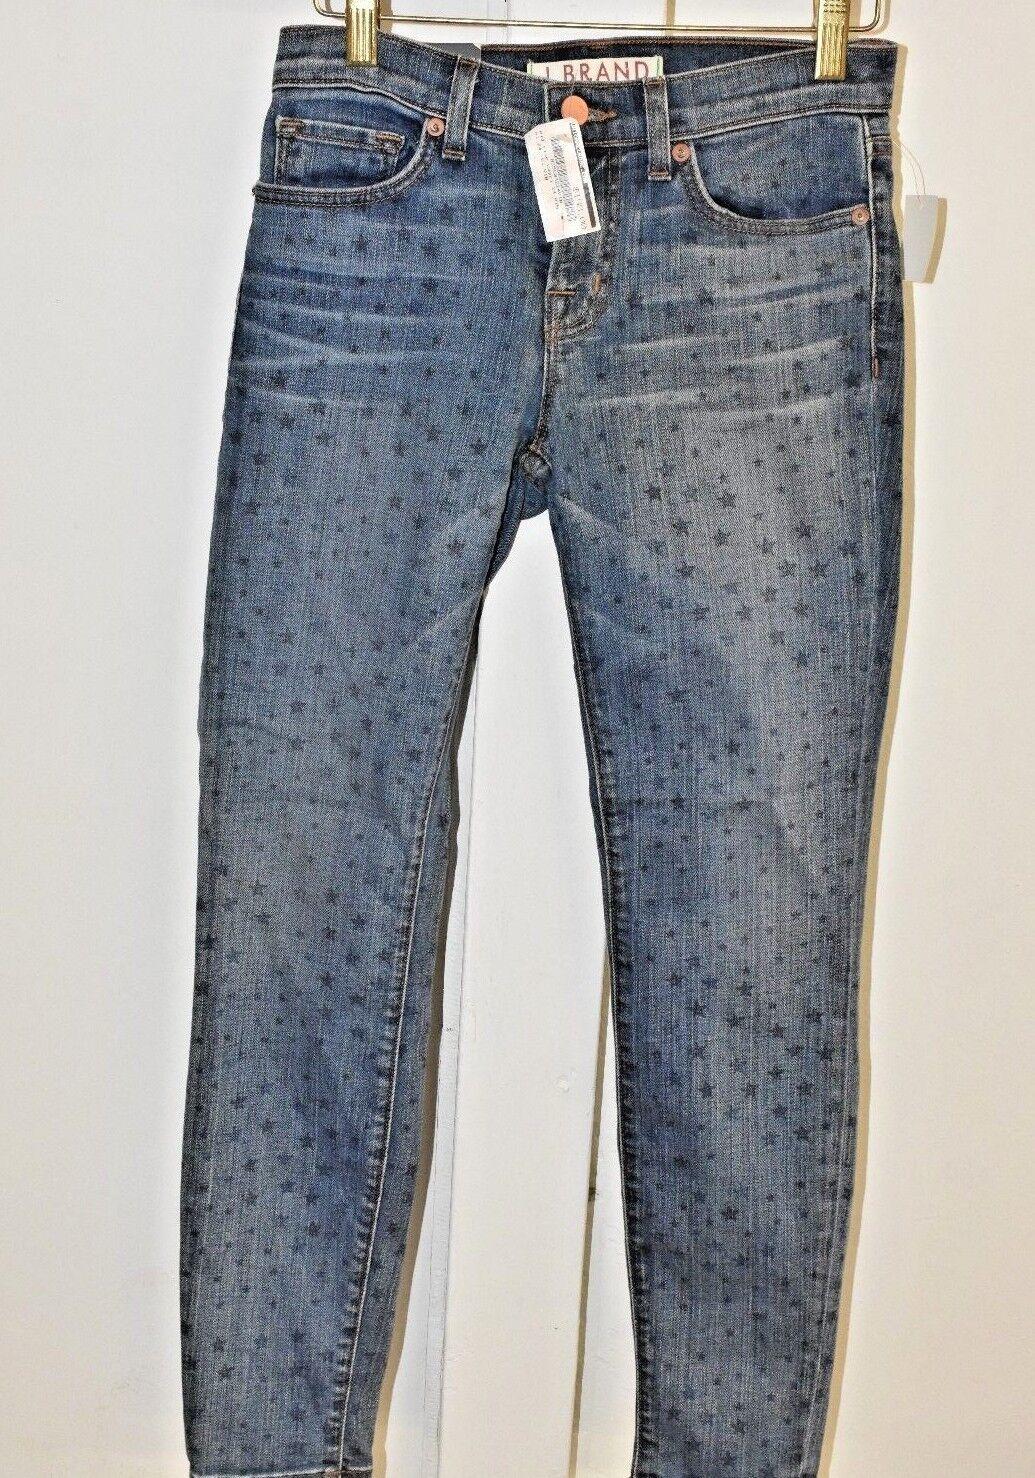 J Brand Mid Rise Capri Indigo Vin  Jeans StarS Drawing blueE  Slim Fit SKINNY